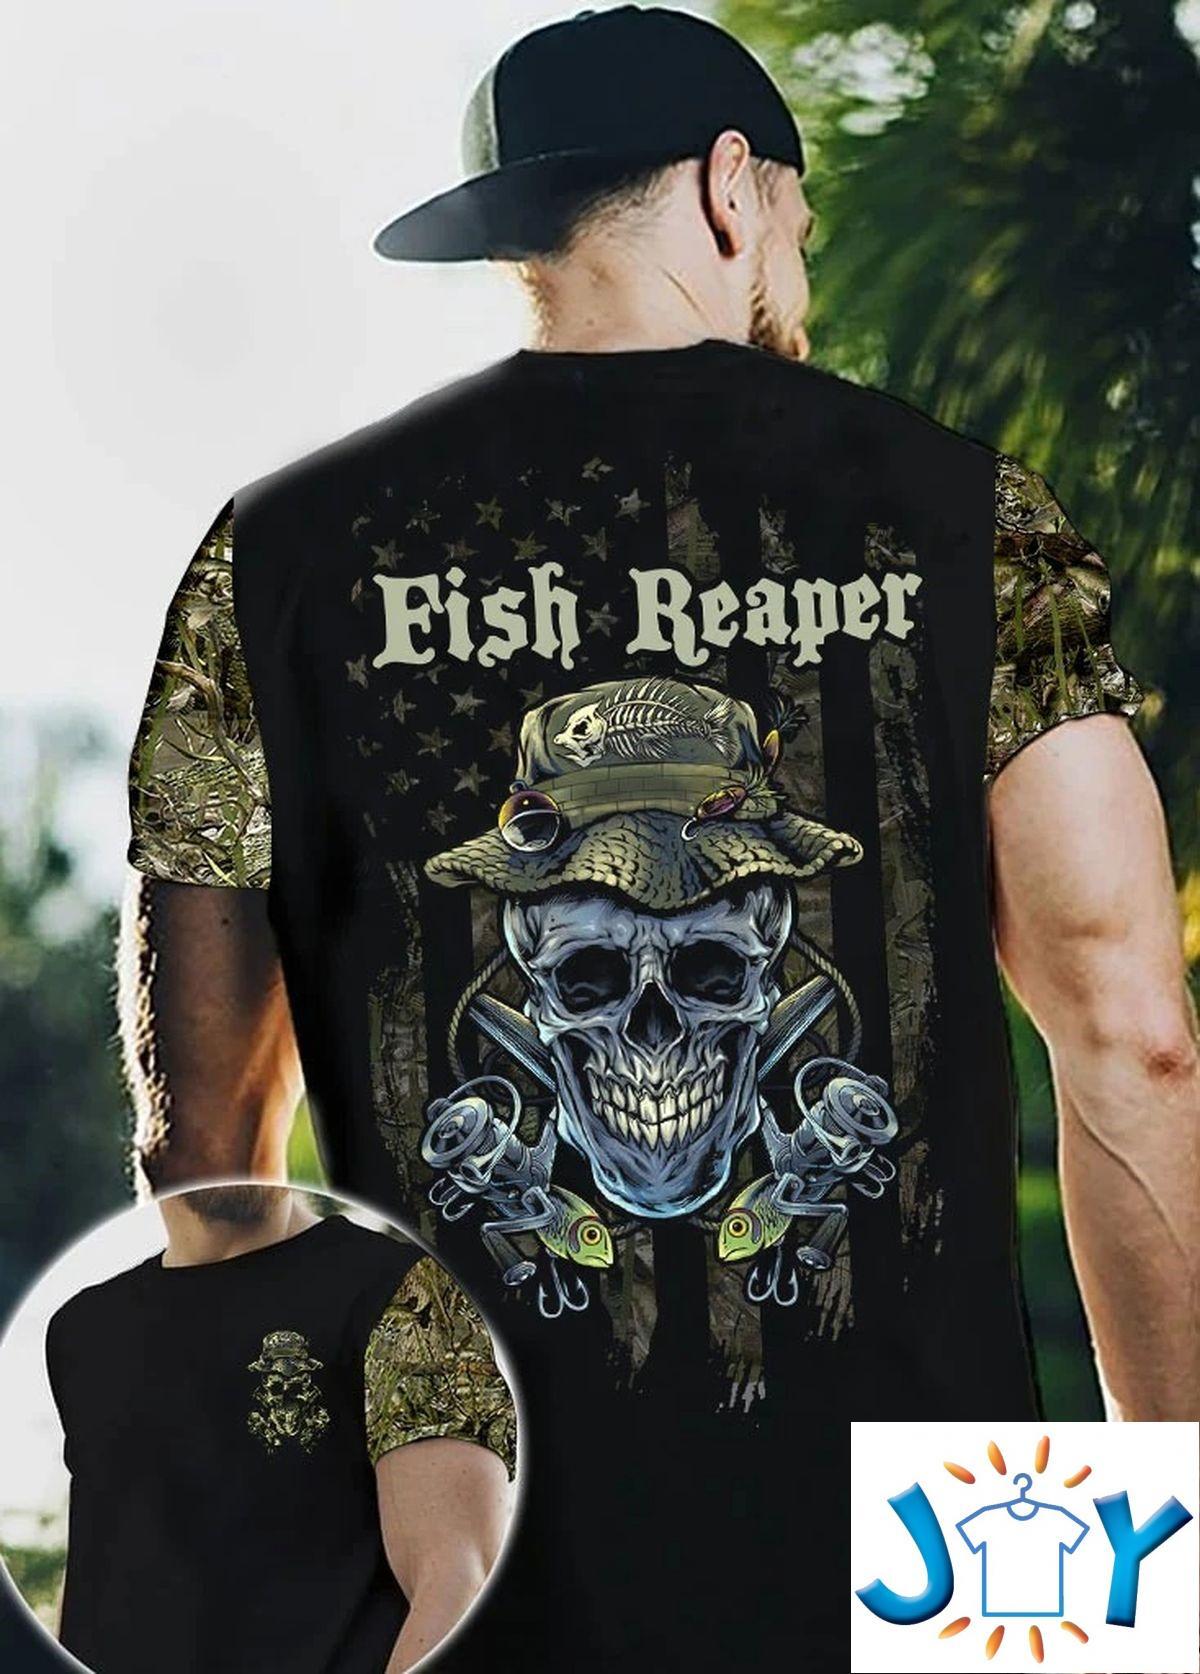 Fish Reaper Skull 3D All Over Print T-Shirt, Hoodie